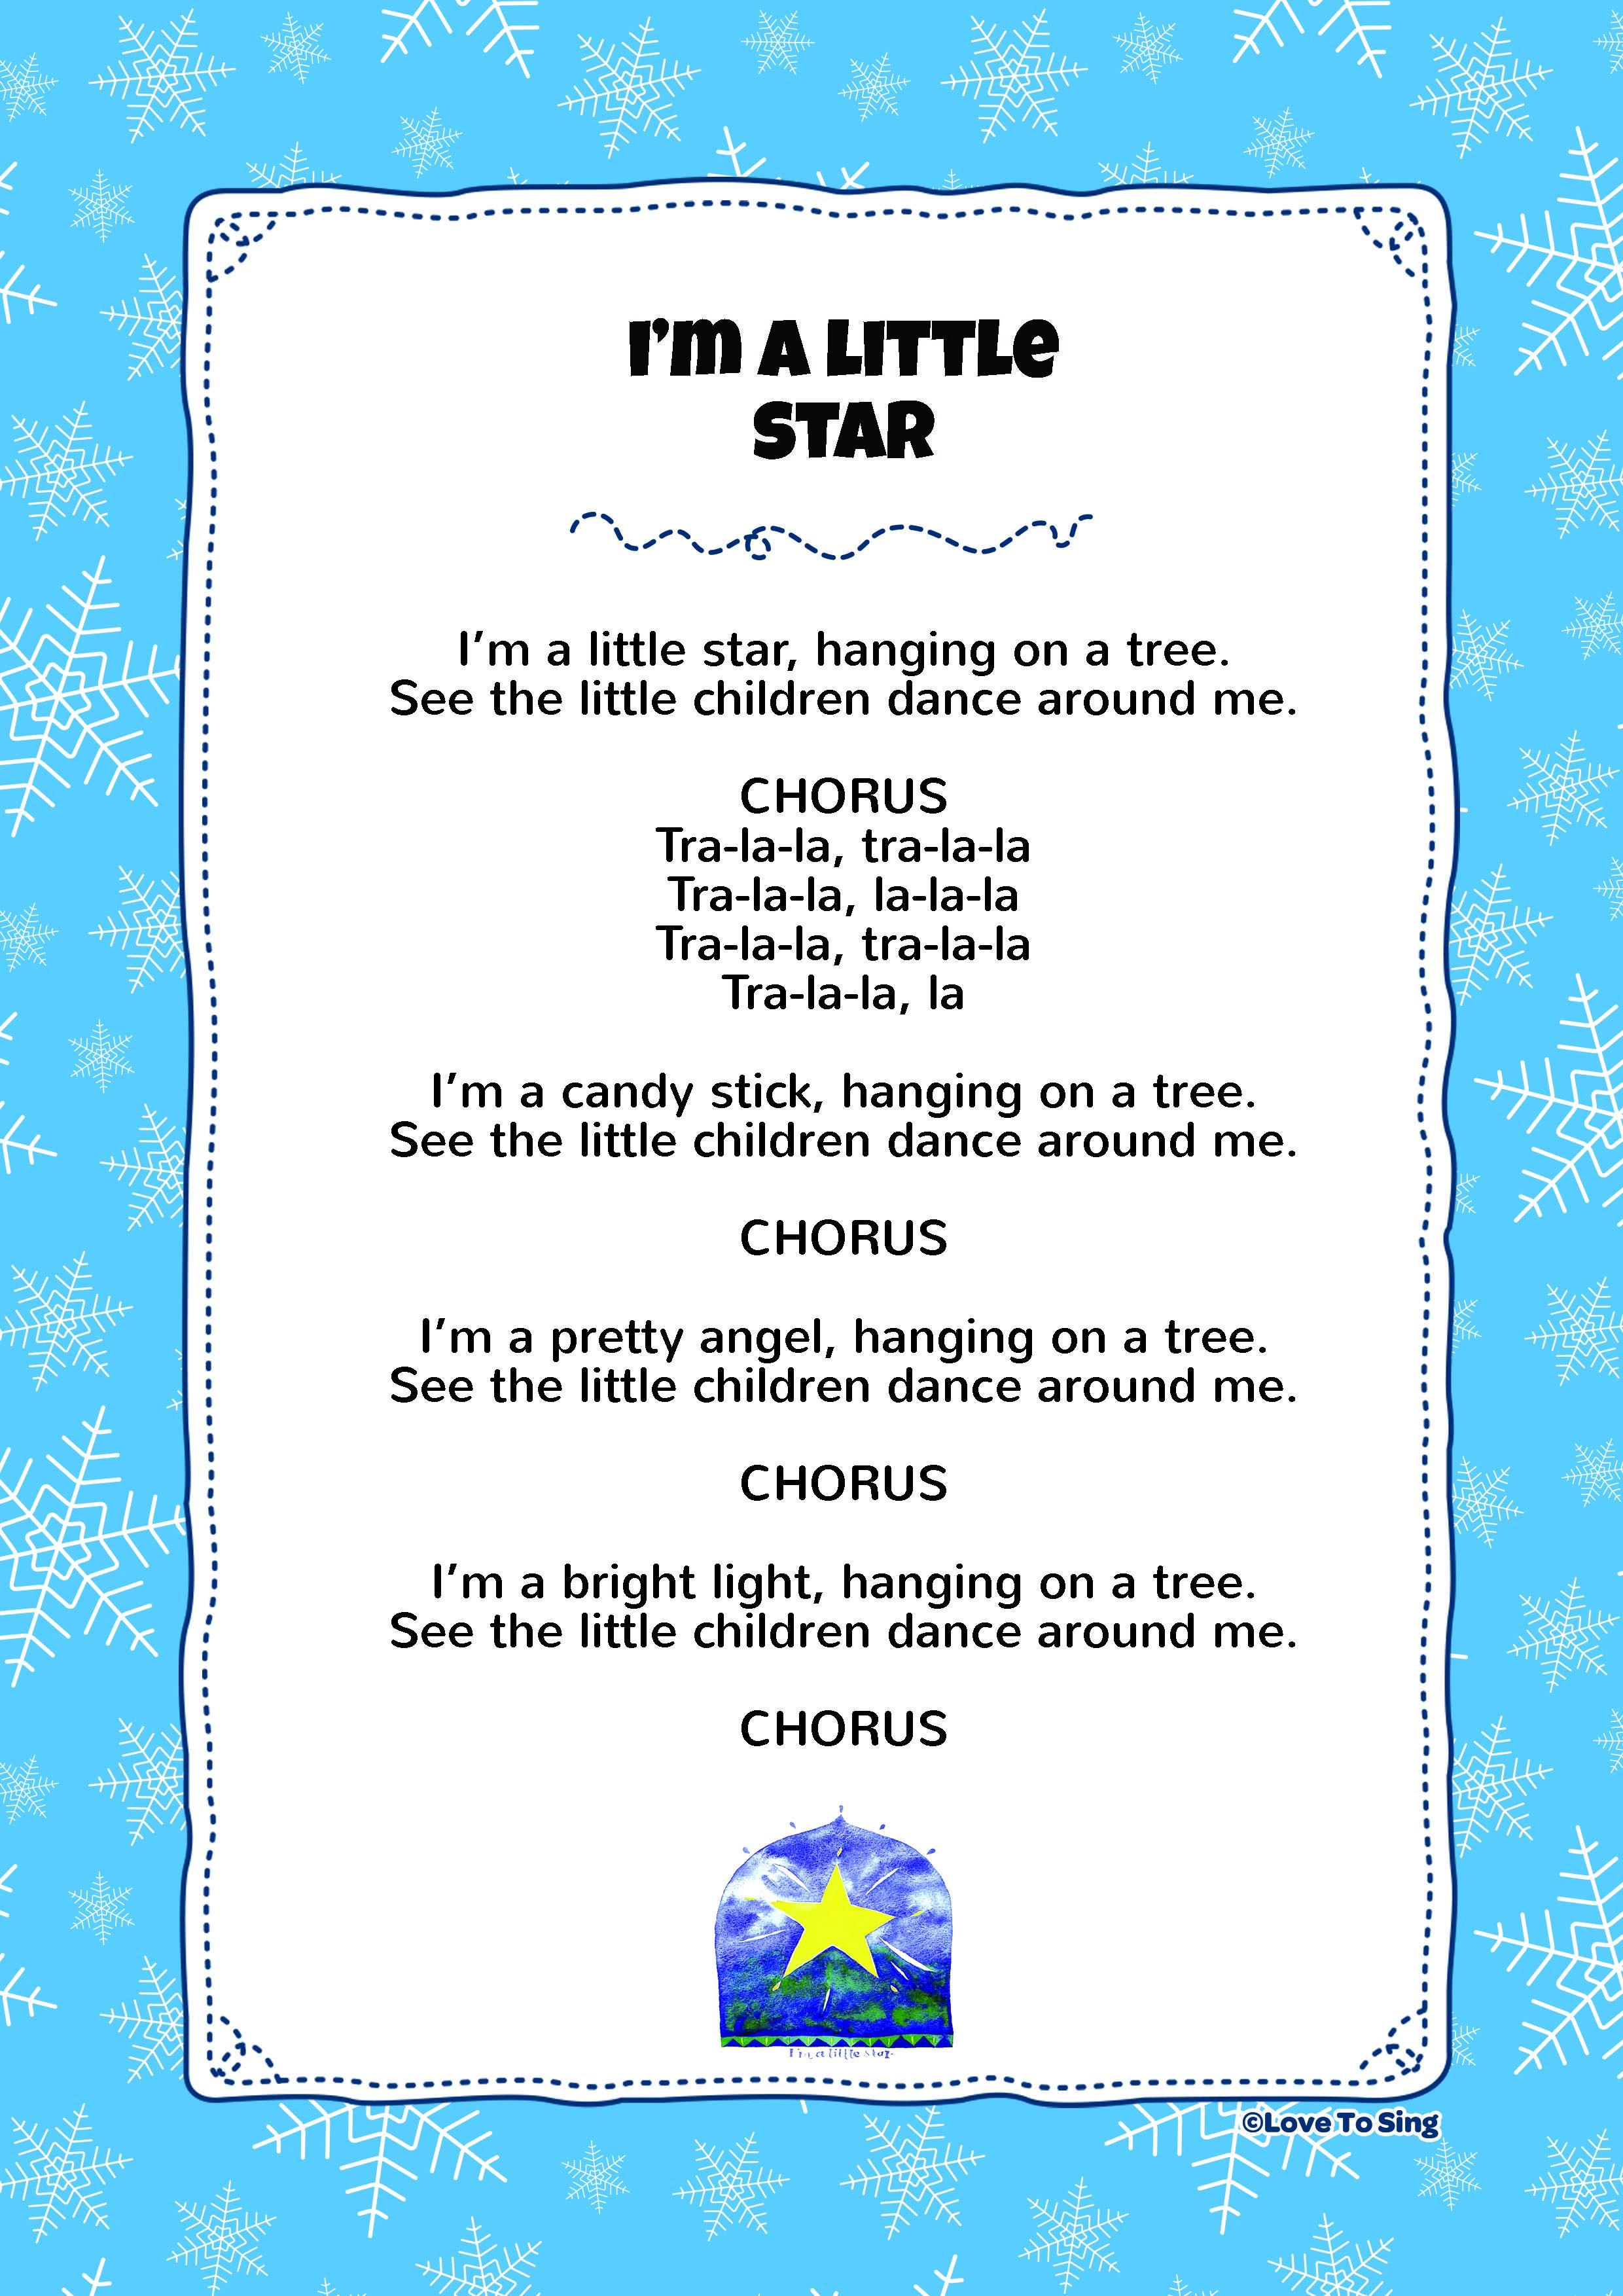 Iu0027m A Little Star | Kids Video Song With FREE Lyrics U0026 Activities!